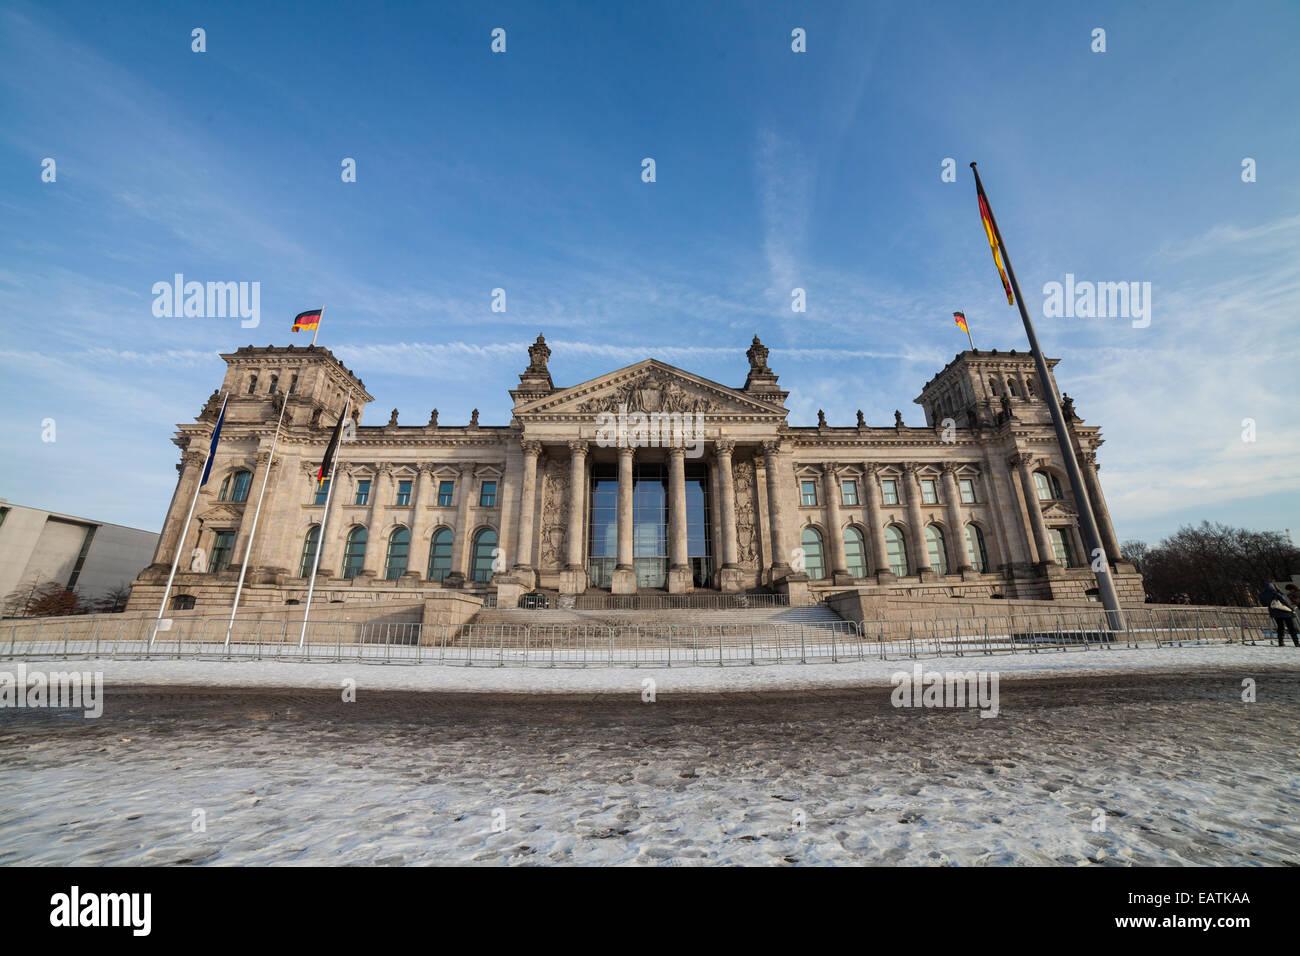 bundestag in berlin in winter time - Stock Image